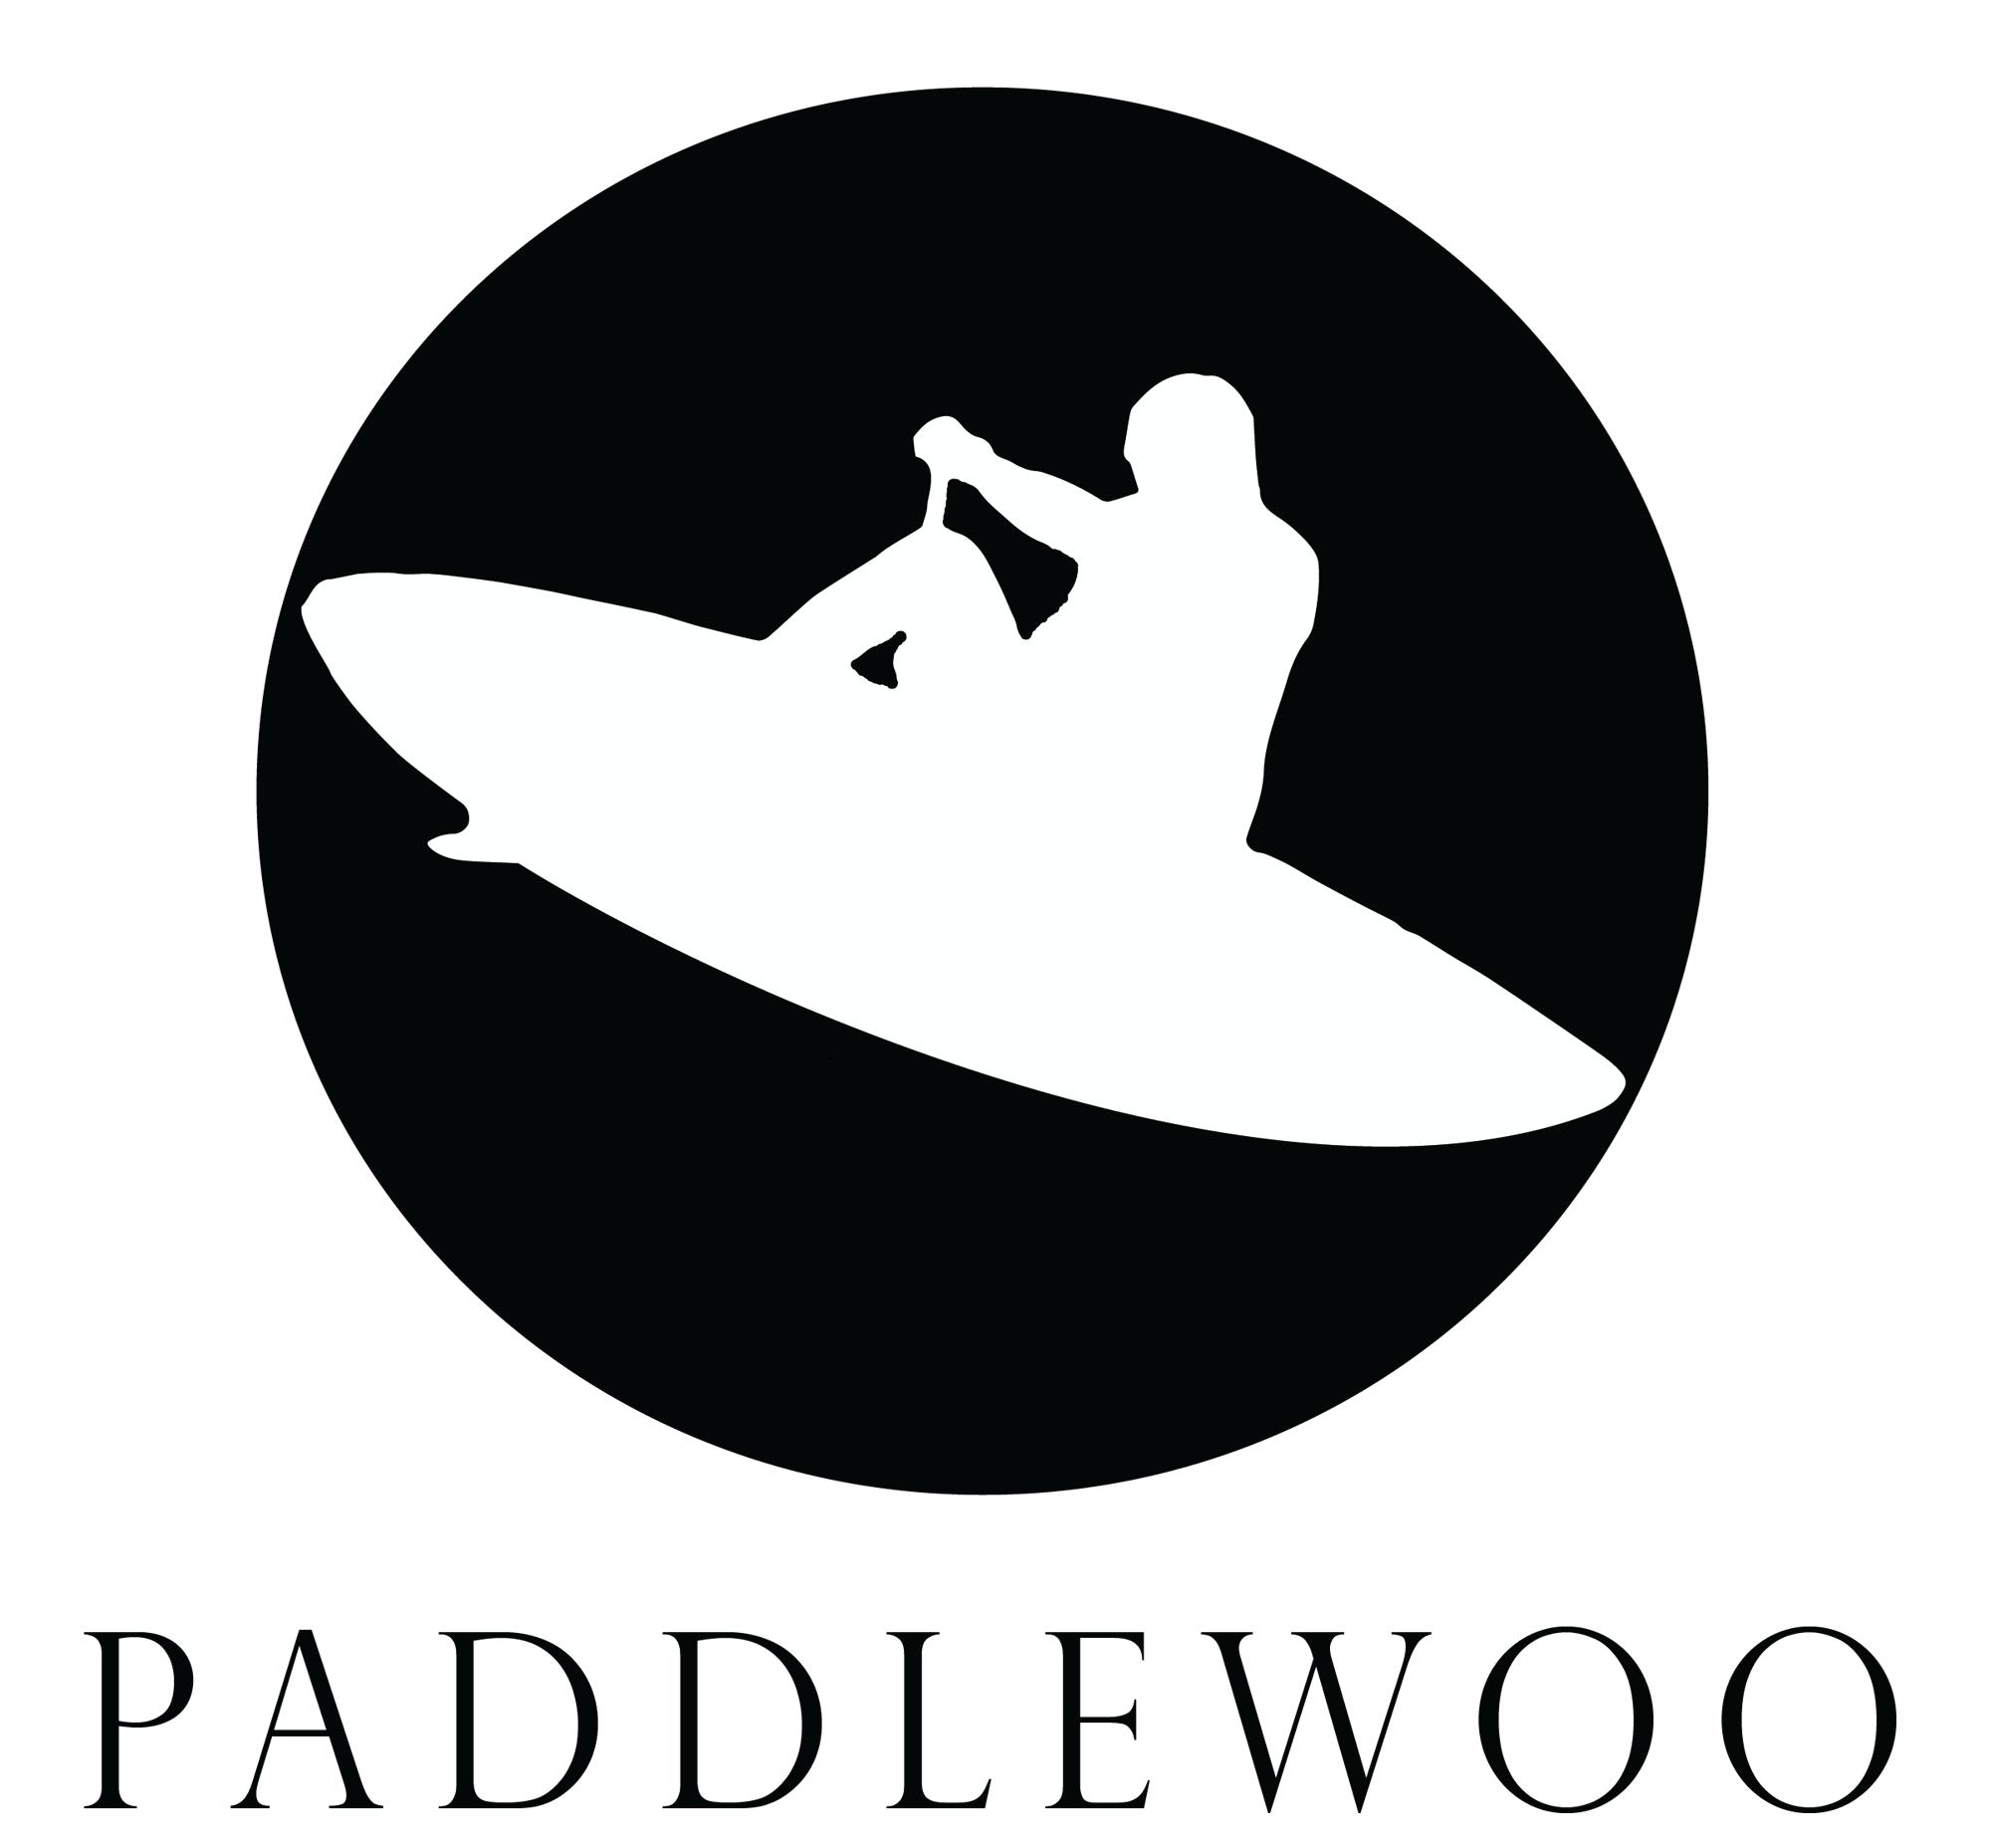 PADDLEWOO - Paddle Enhanced Surfing